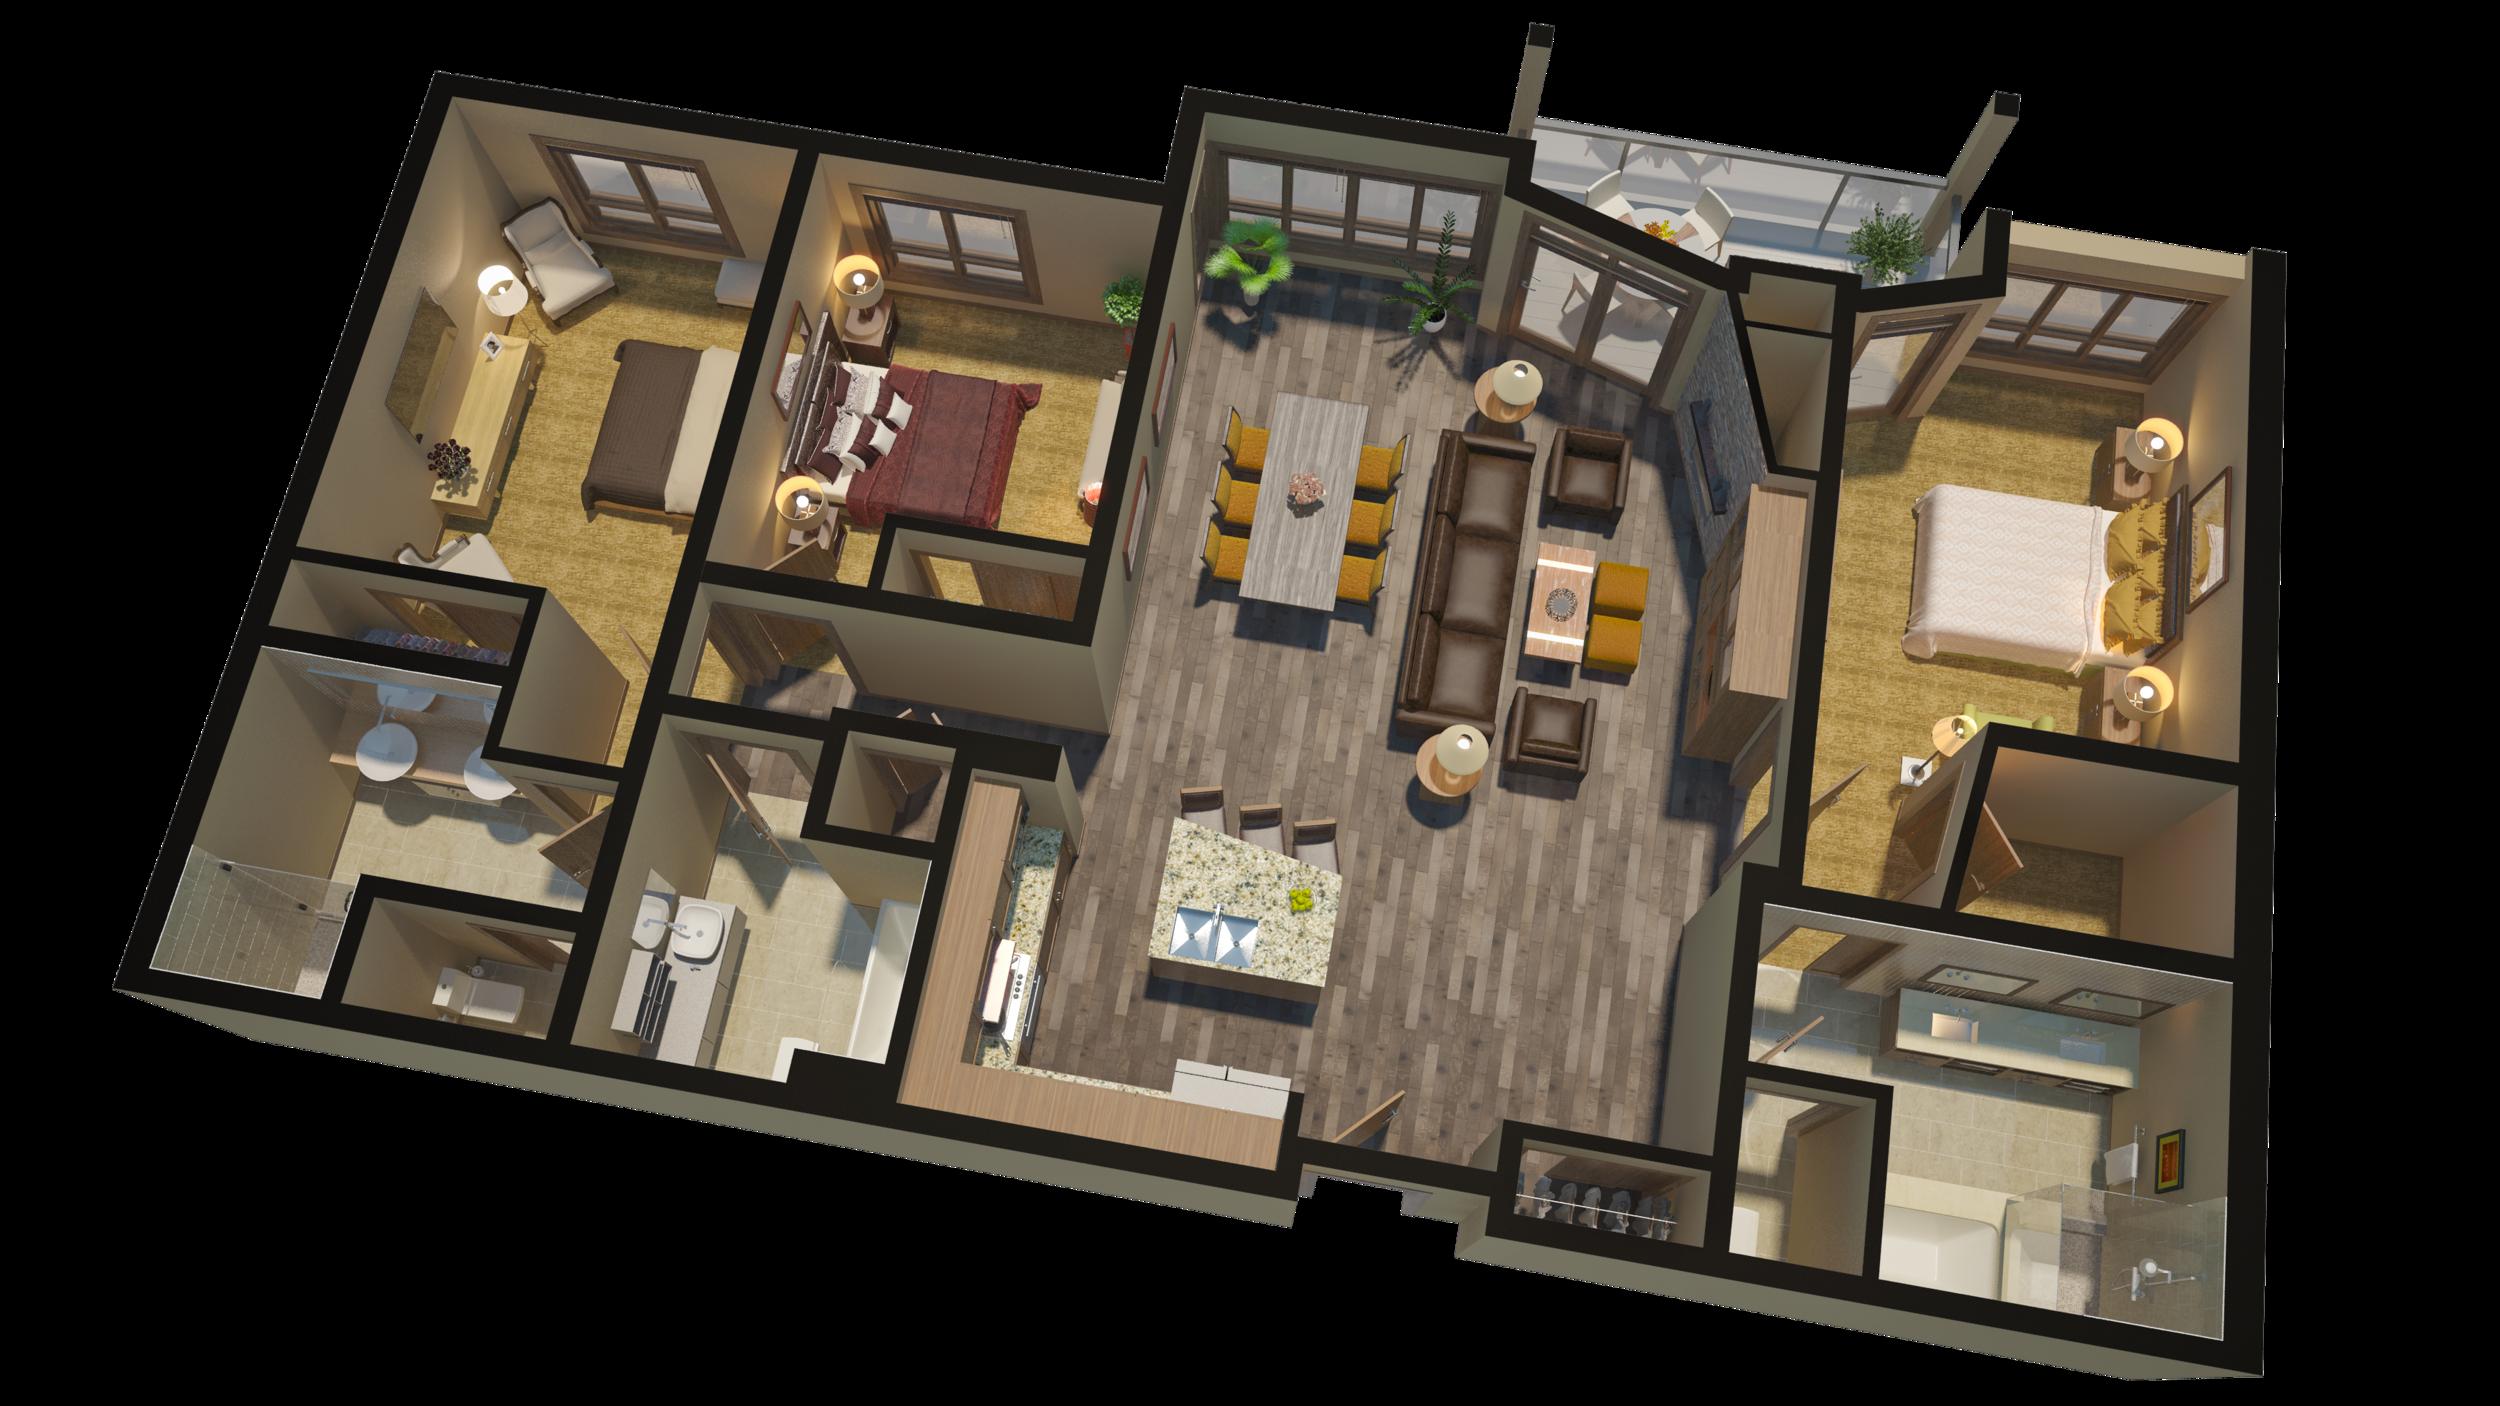 3d-floor-plan-rendering-high-end-home